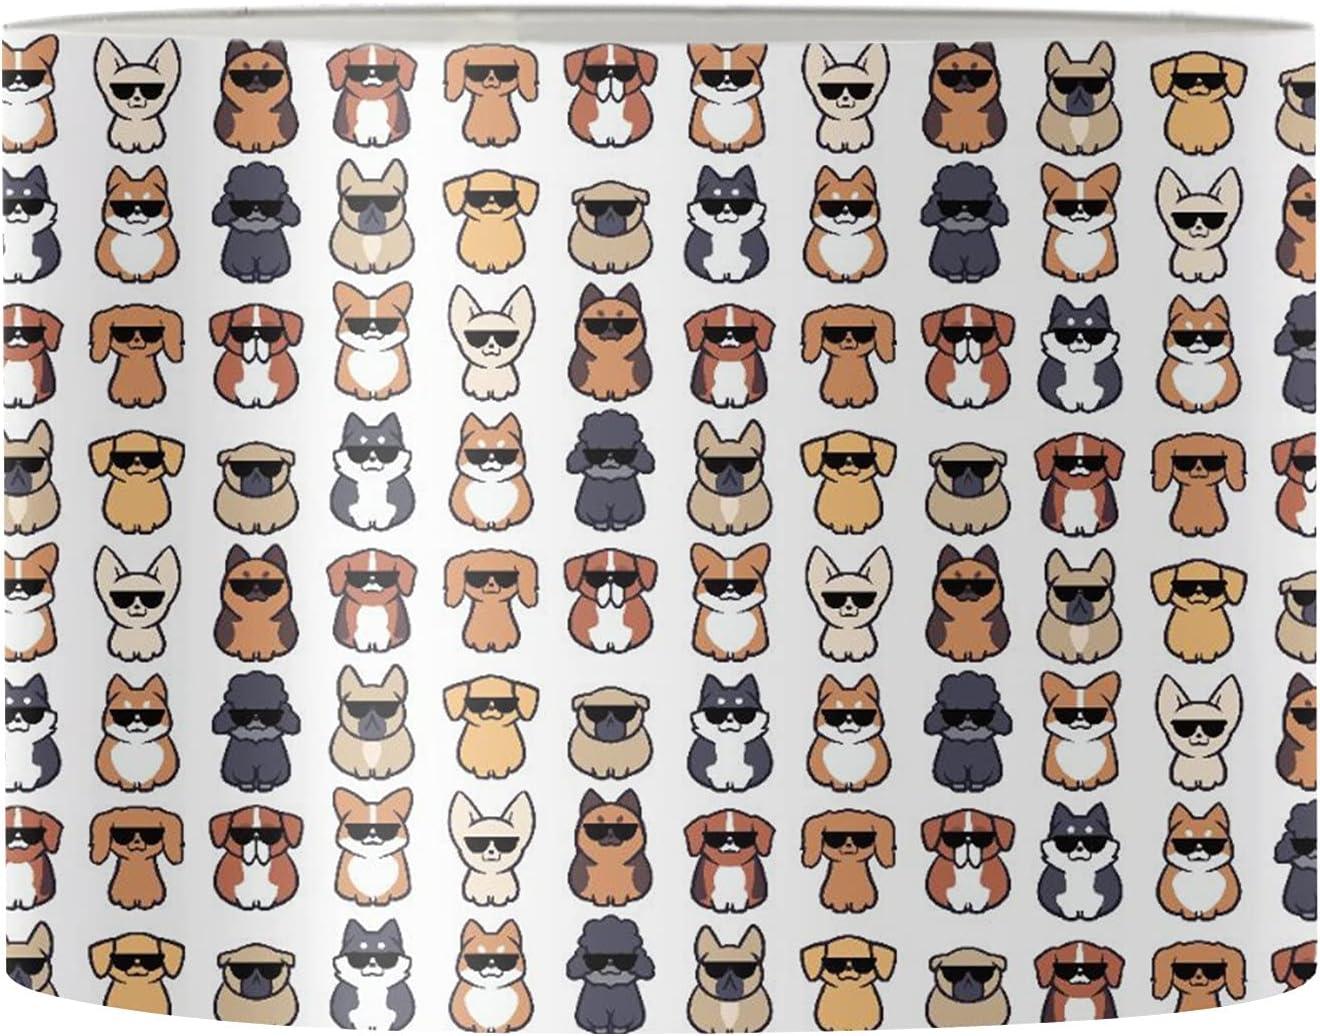 Poceacles Dog Animal Modern Sacramento Mall Lamp Cover Shade Kids Translated Cute for